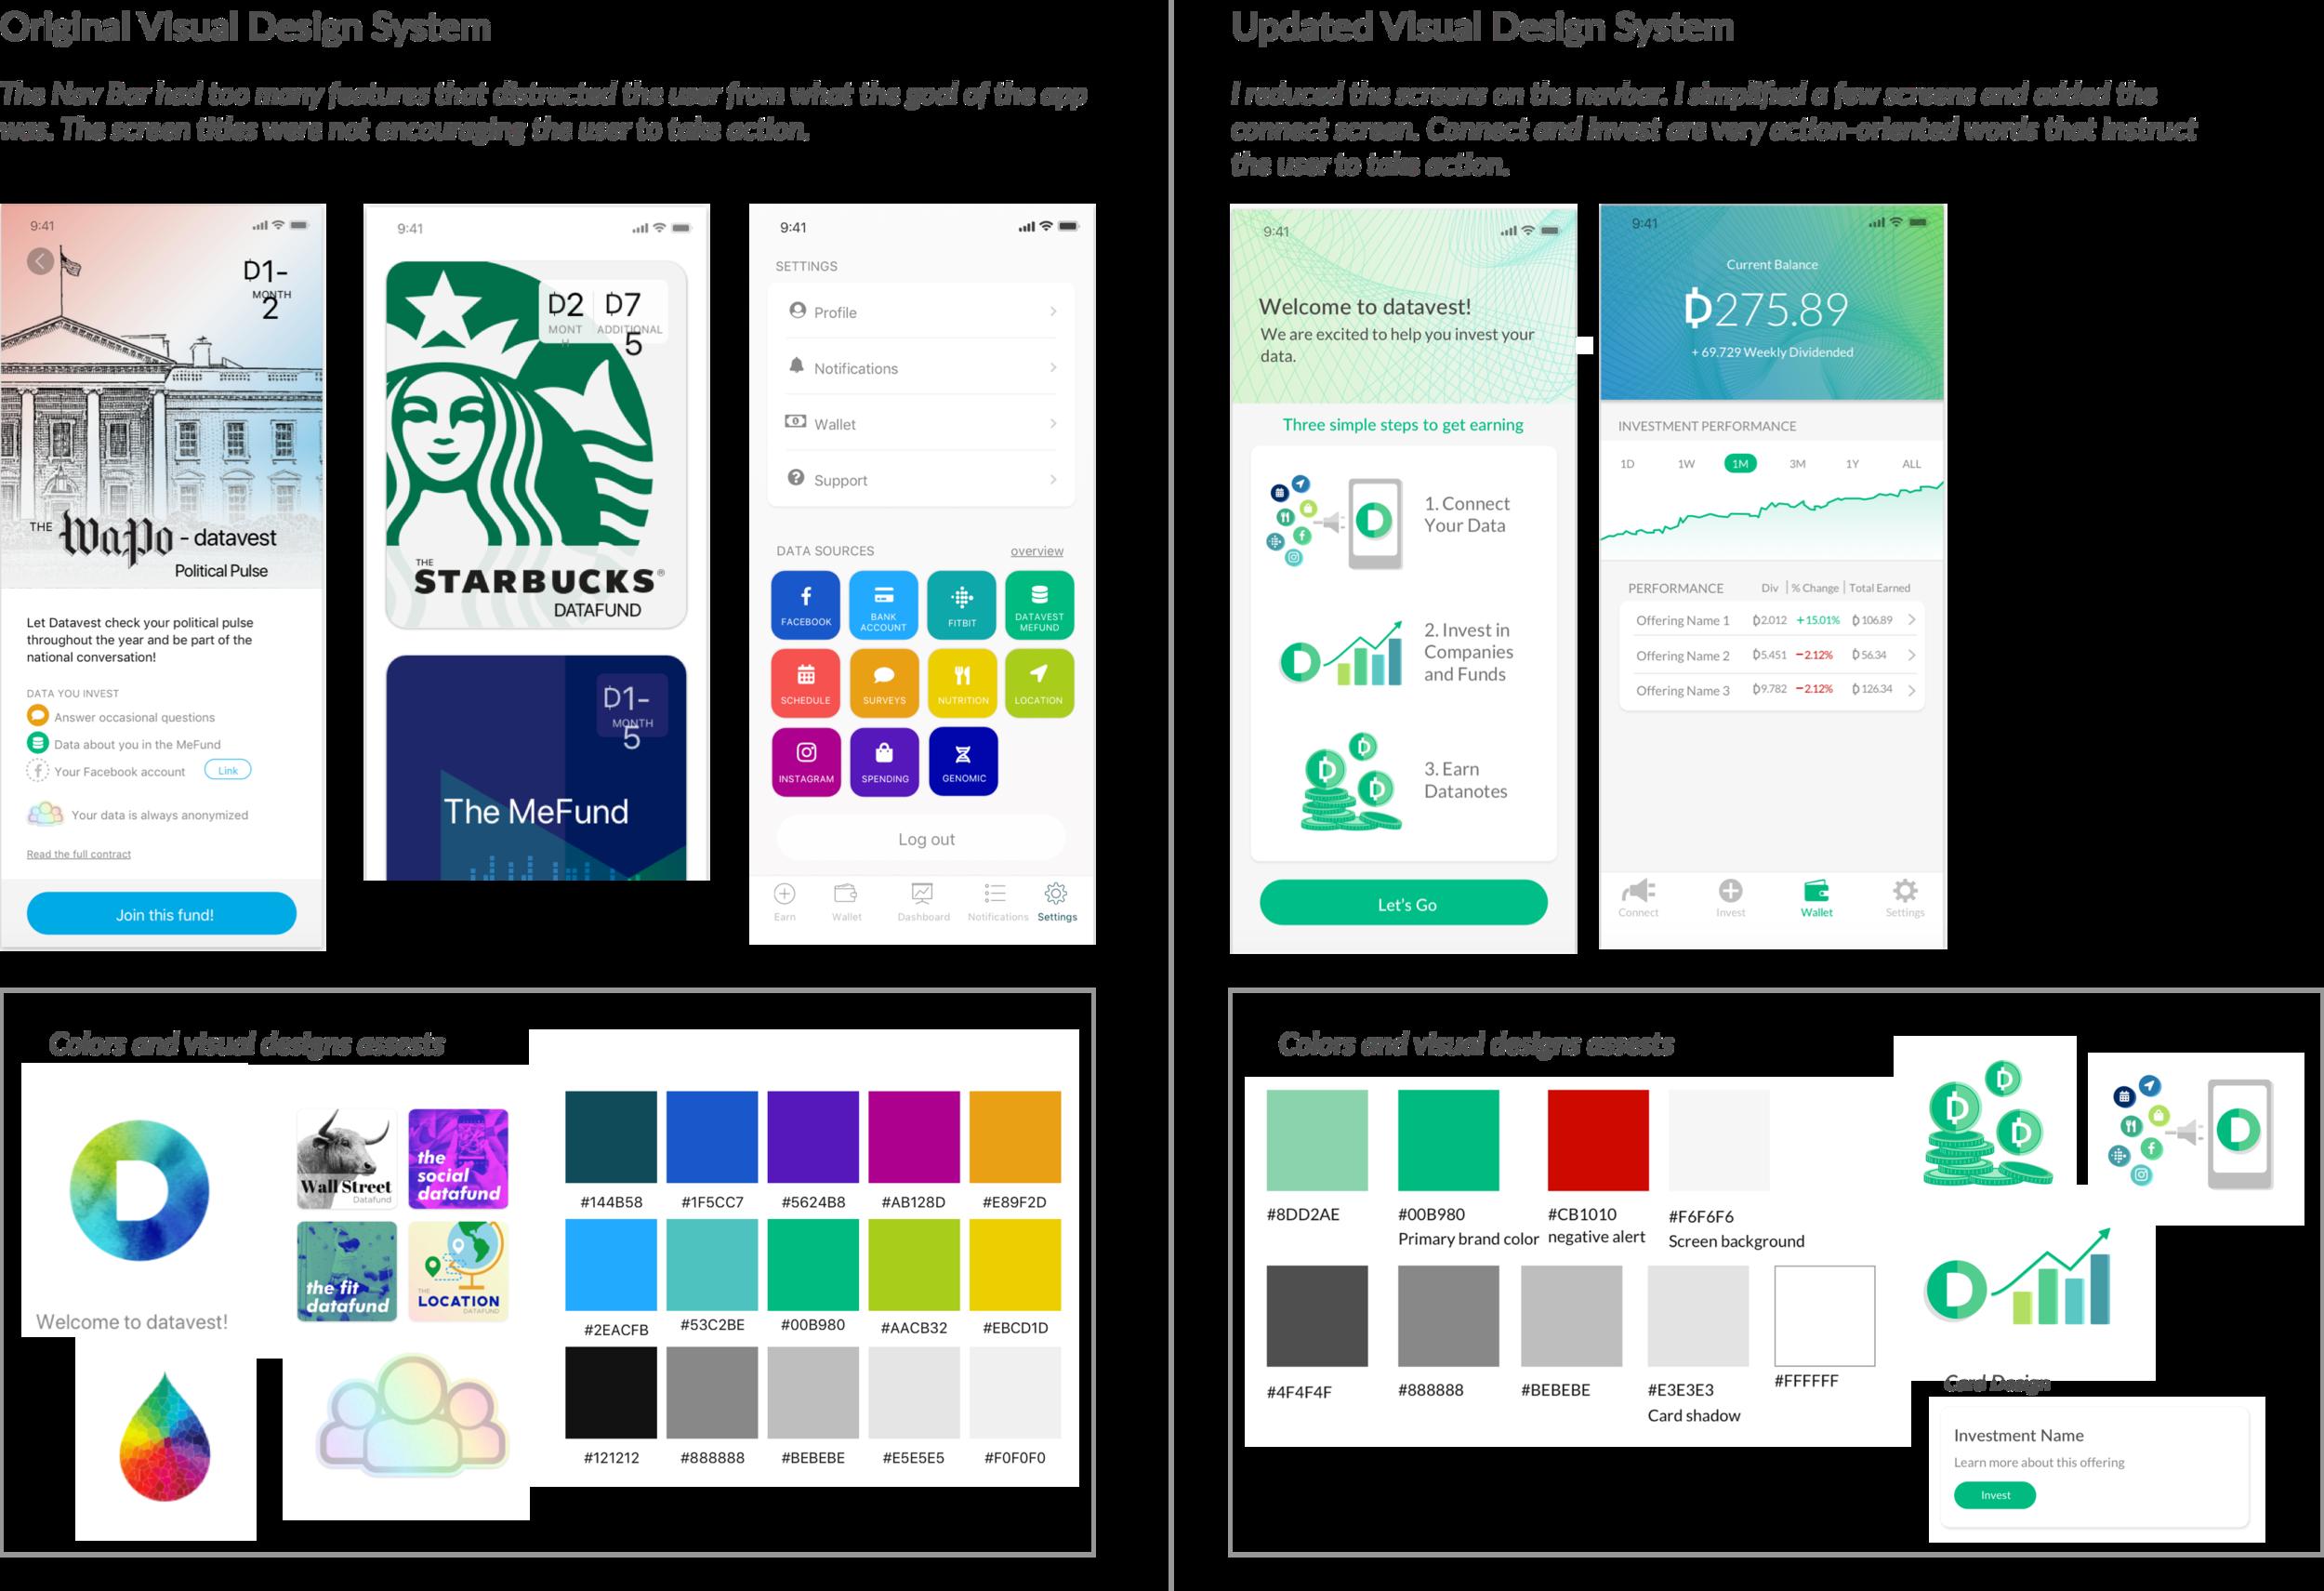 Visual Design Update.png